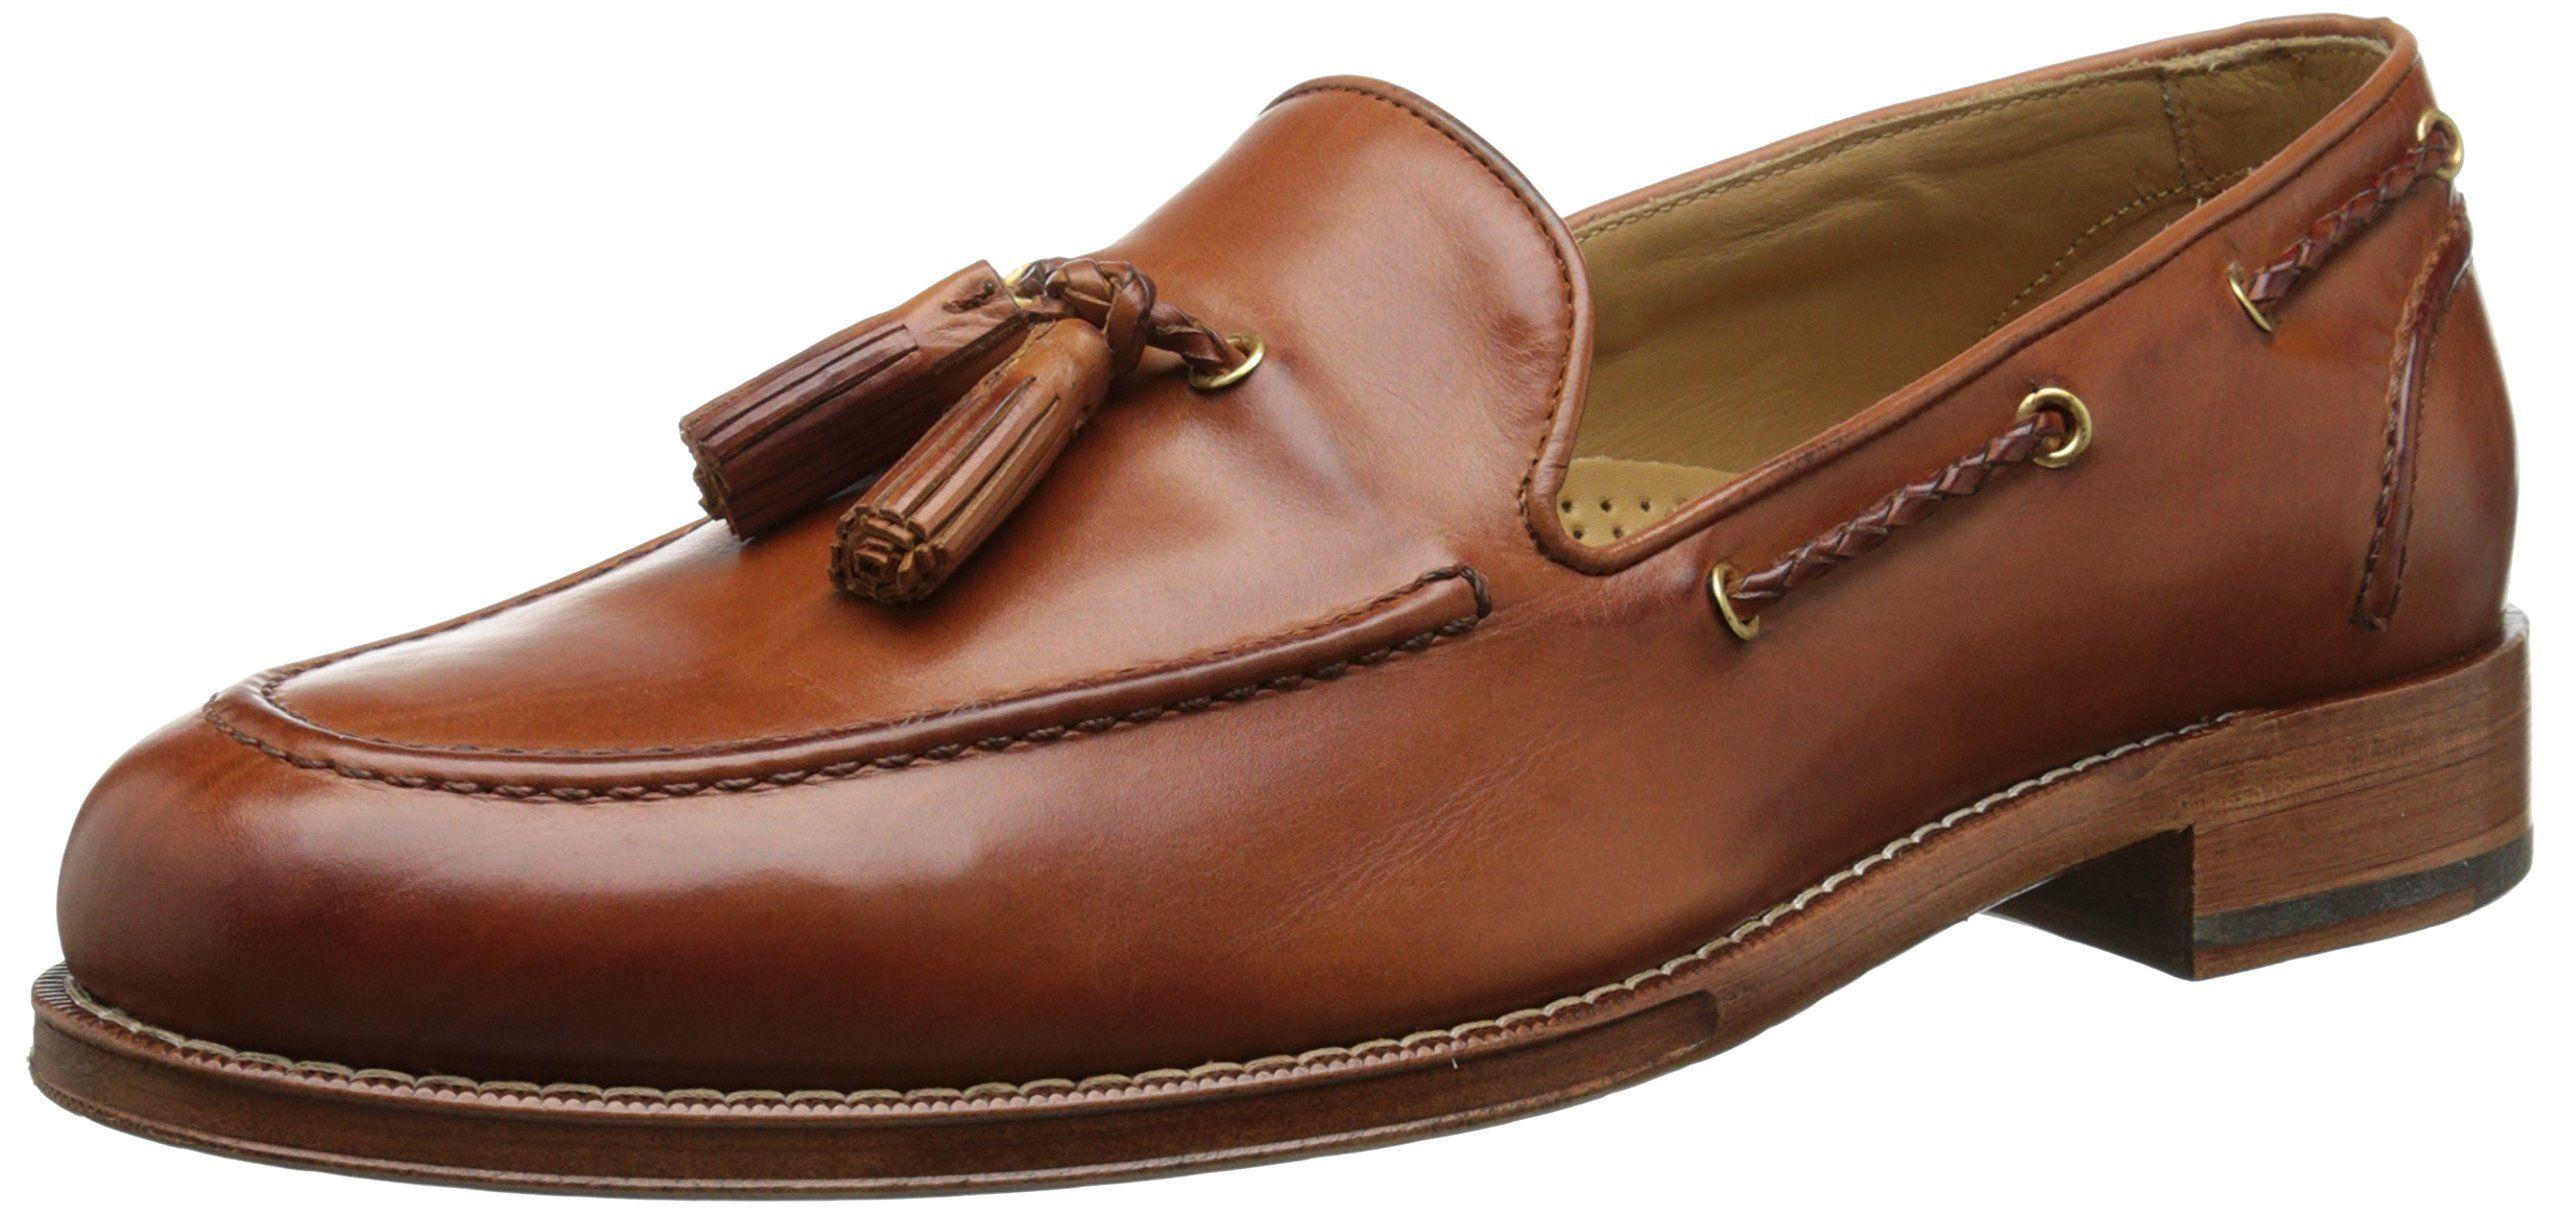 e197bc6cfc0 Amazon.com  Cole Haan Men s Brady Belgian Tassel Slip-On Loafer  Shoes